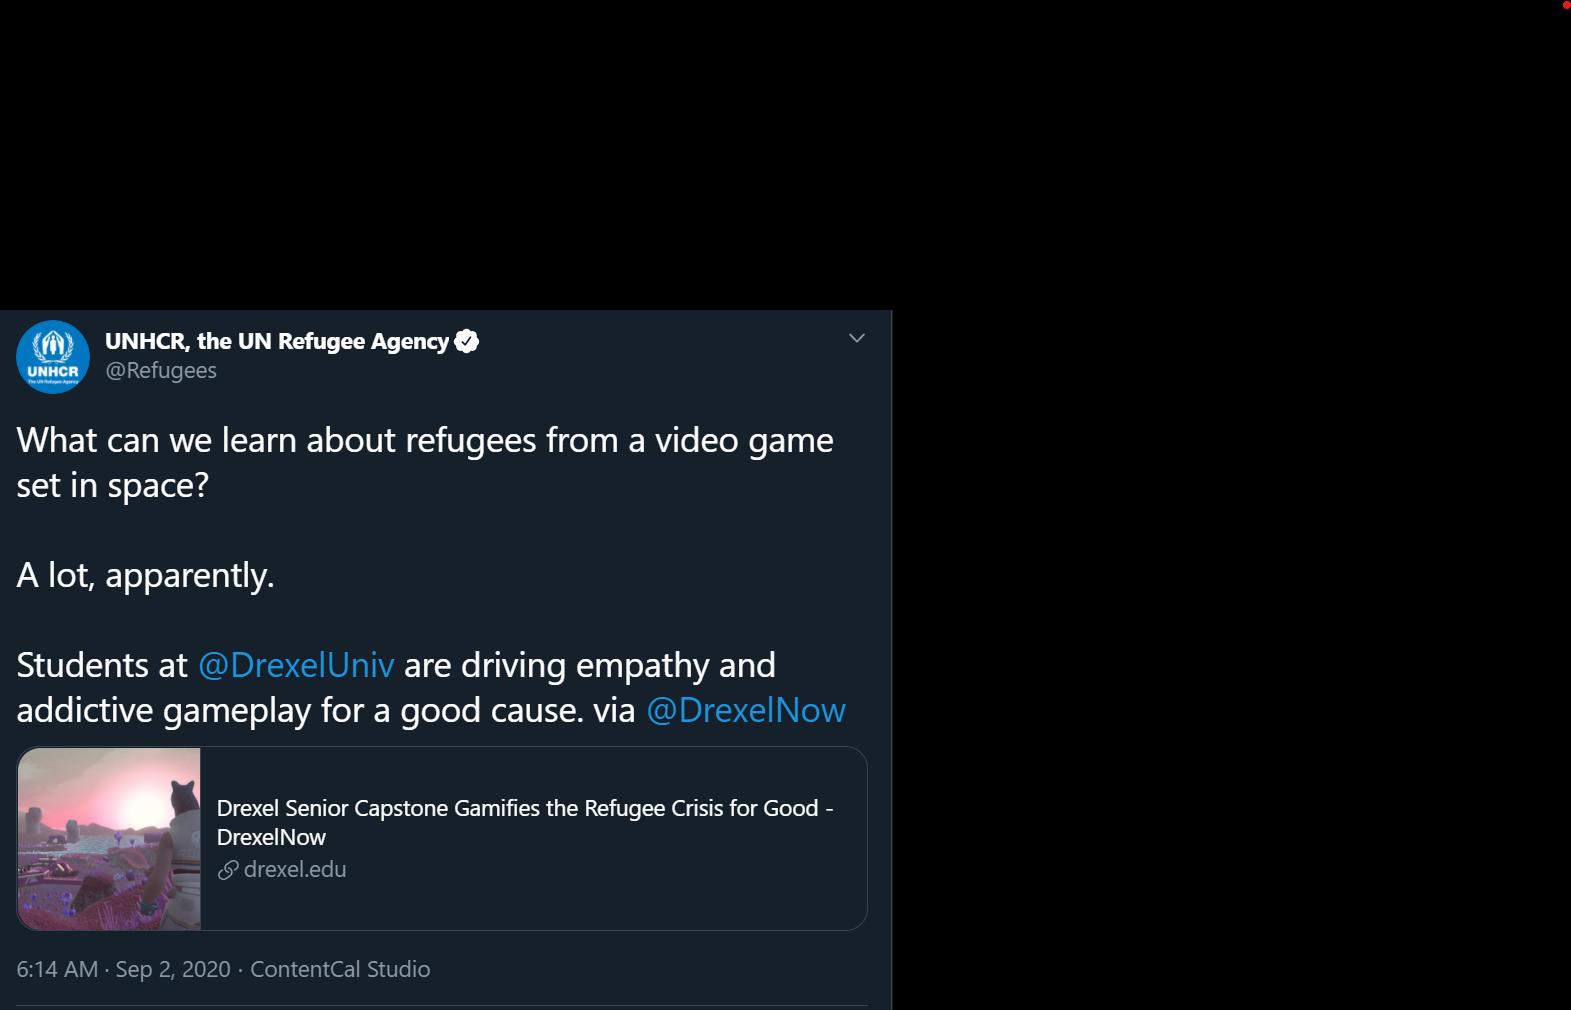 UNHCRTweet